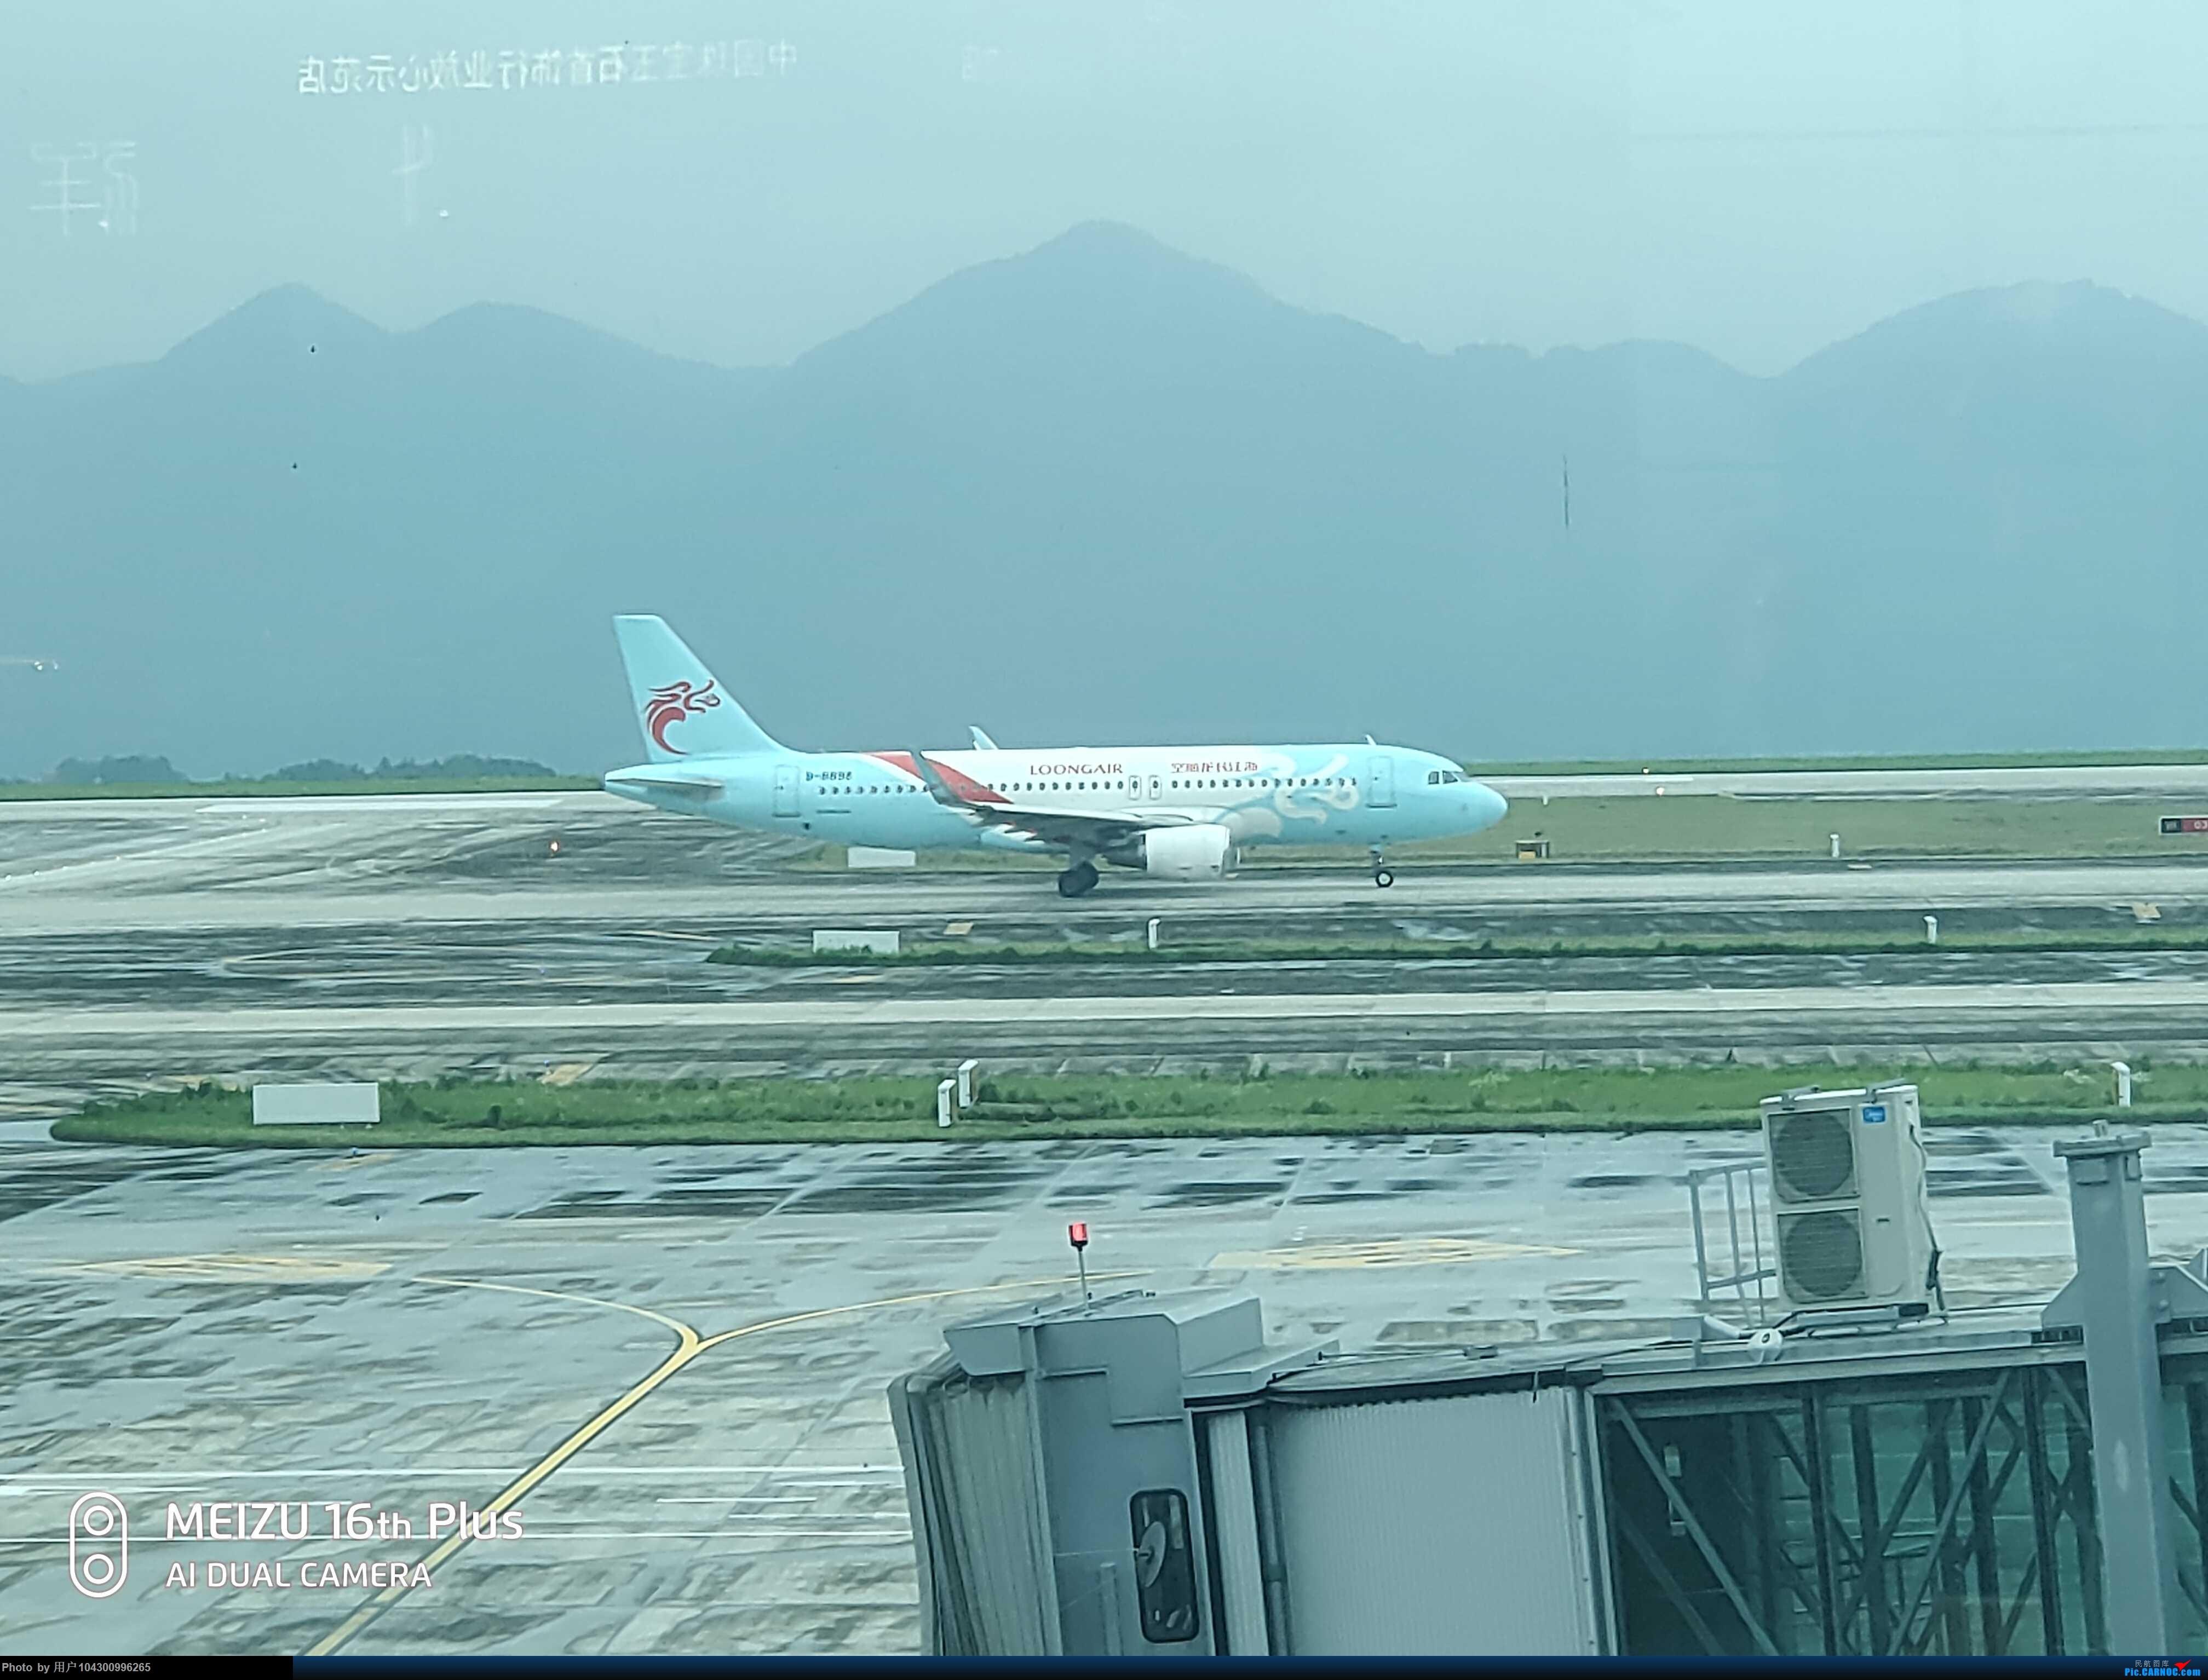 Re:[原创]〖DM哥游记〗多彩贵州航空~重庆--贵阳 AIRBUS A320-200 B-8898 中国重庆江北国际机场